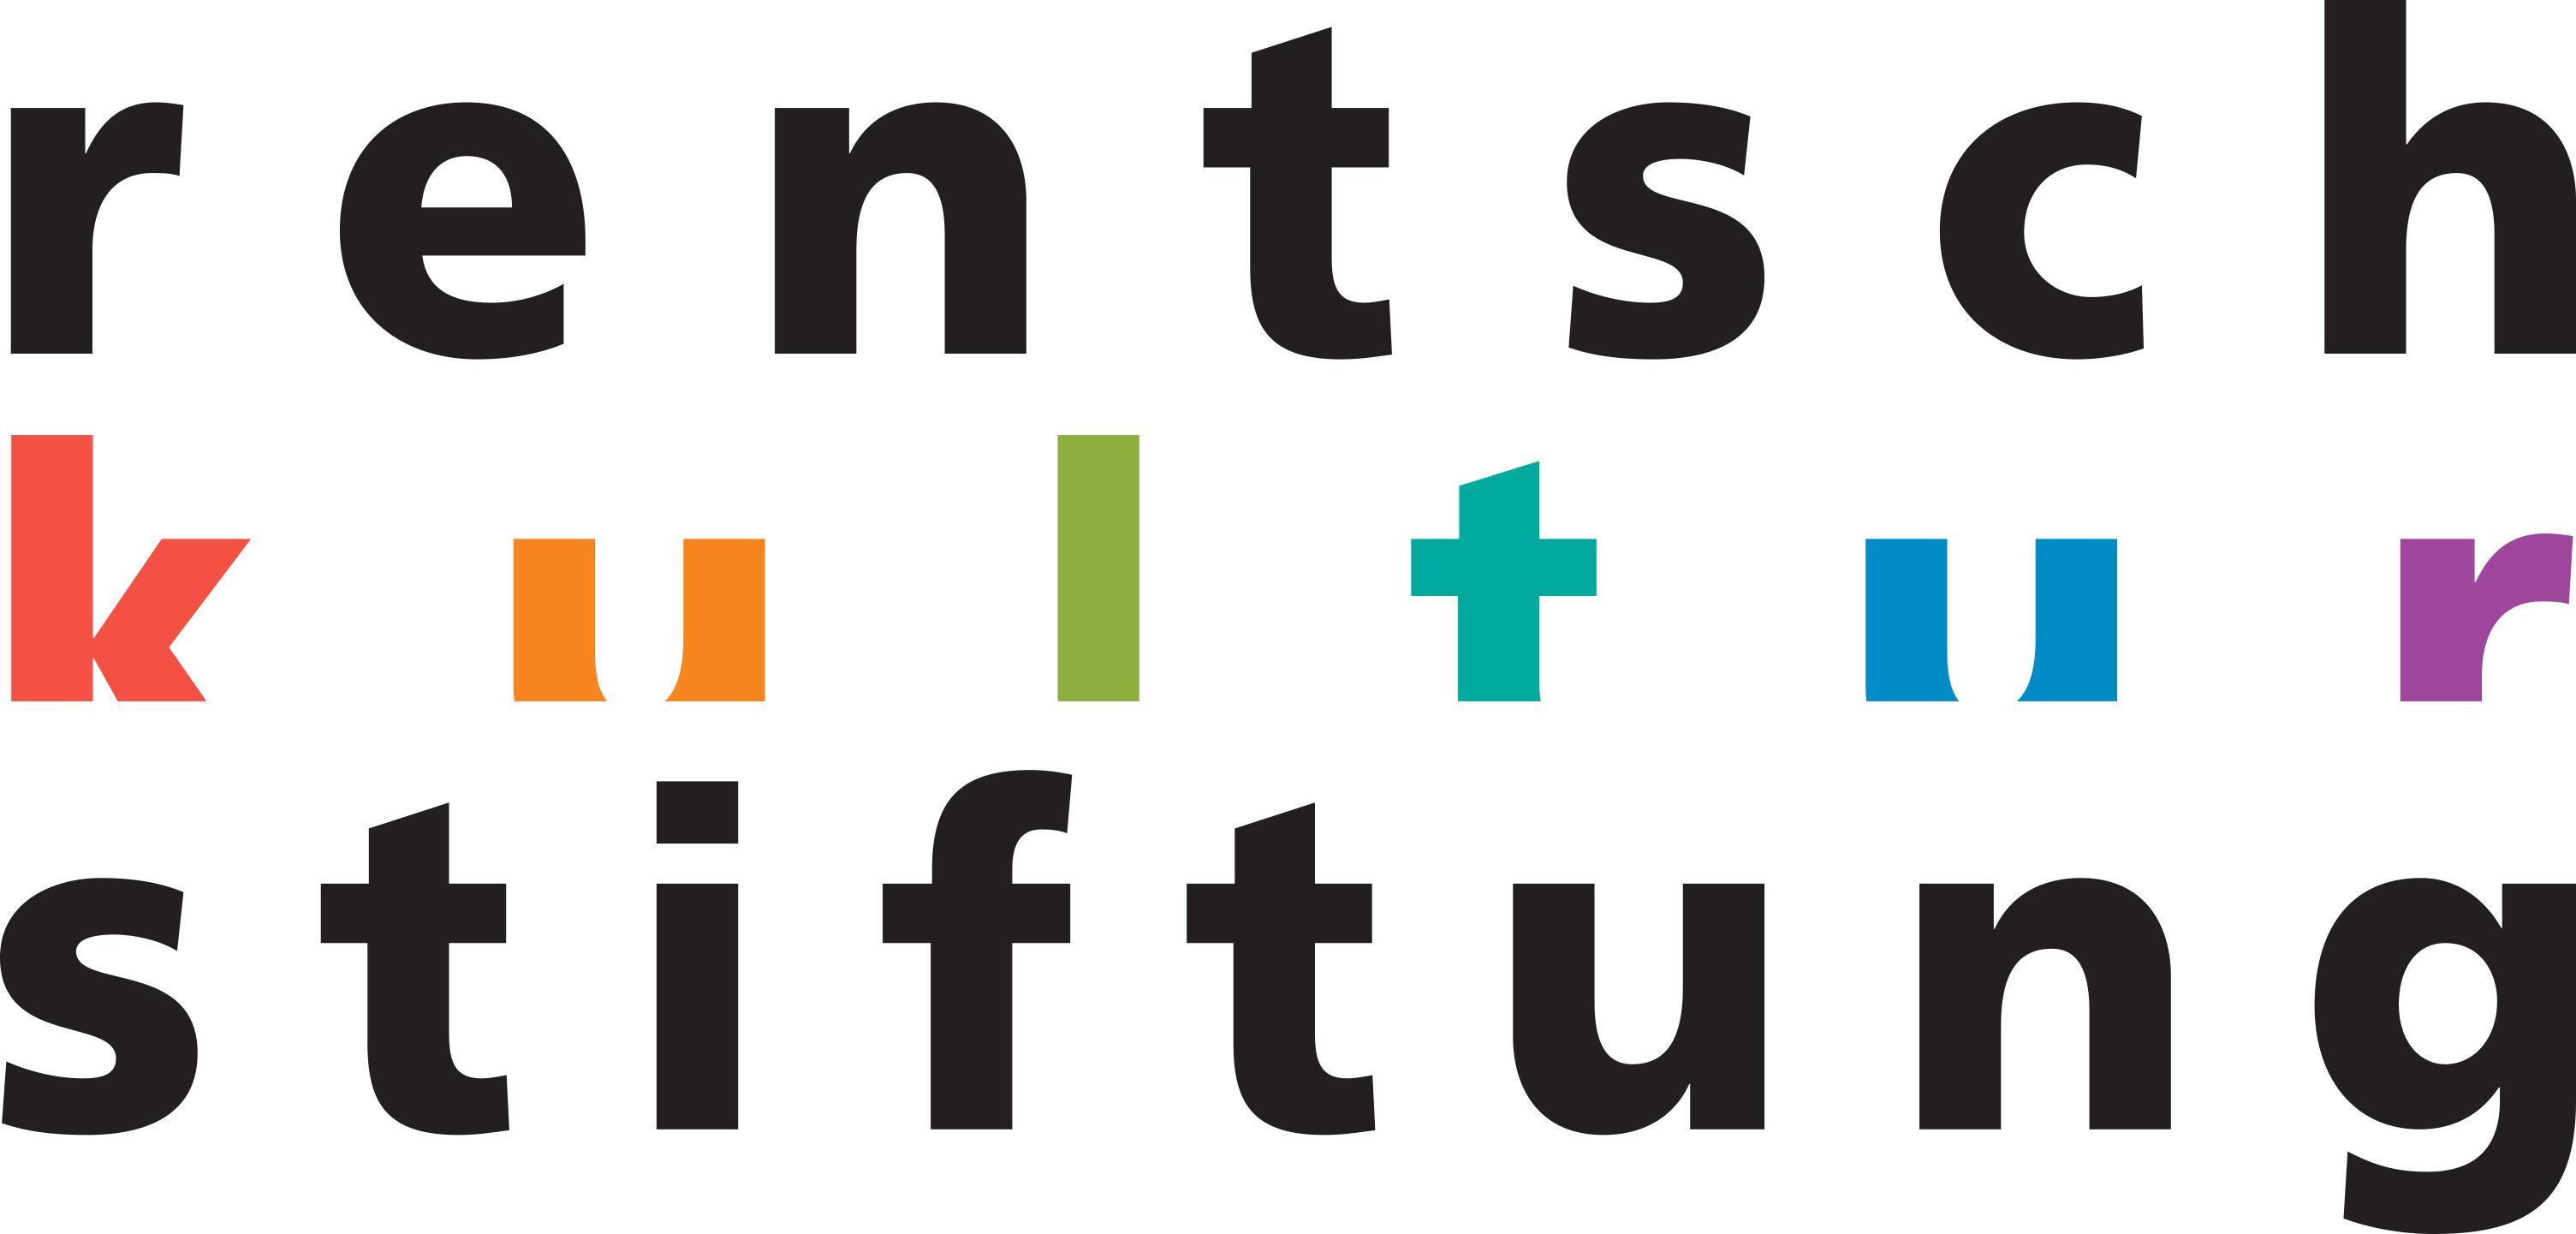 Rentsch Kultur Stiftung